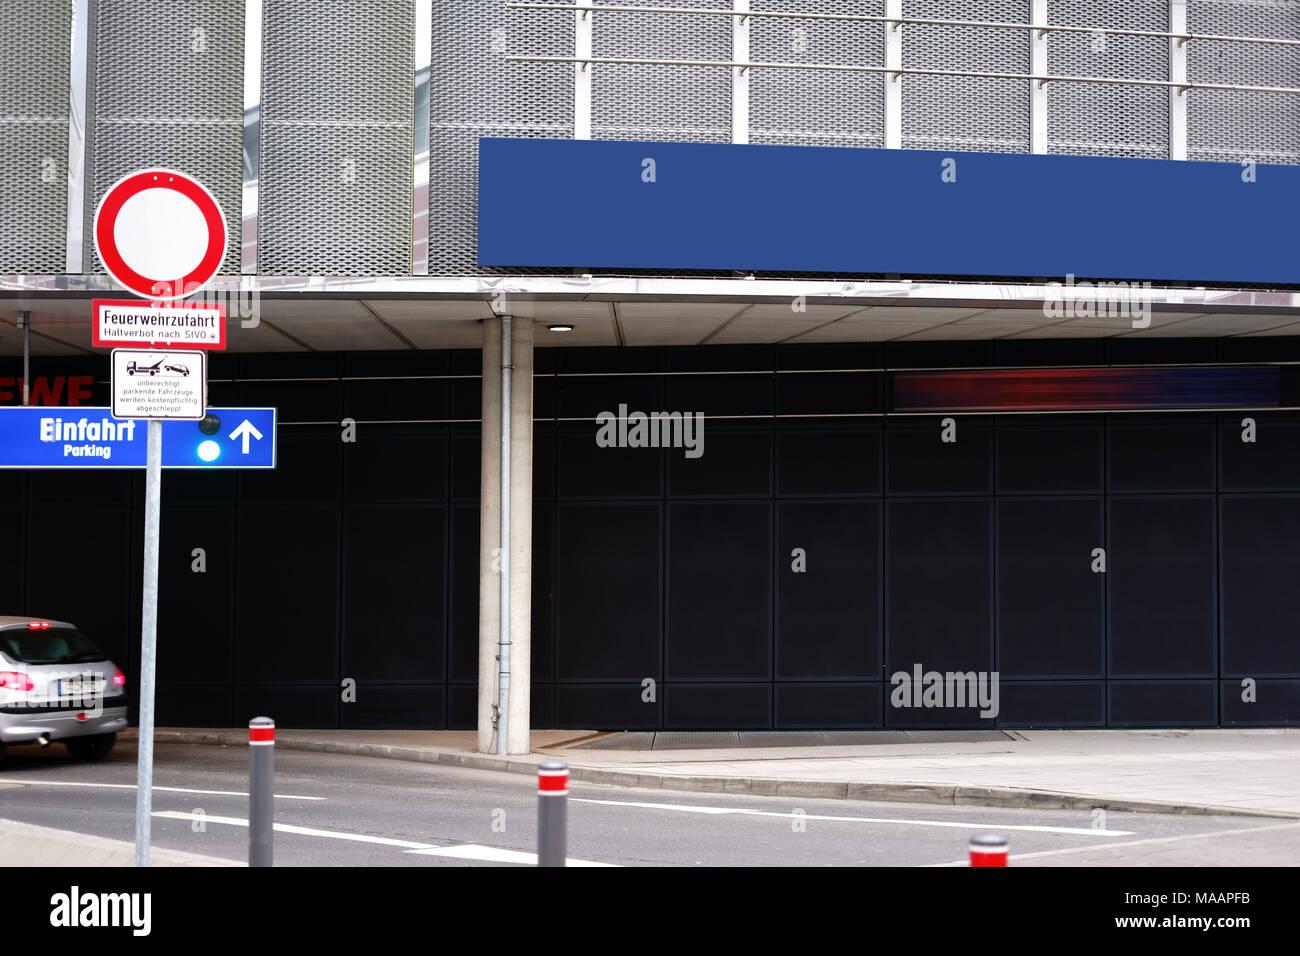 Underground car park entrance stock photos underground for Garage europe auto center fresnes